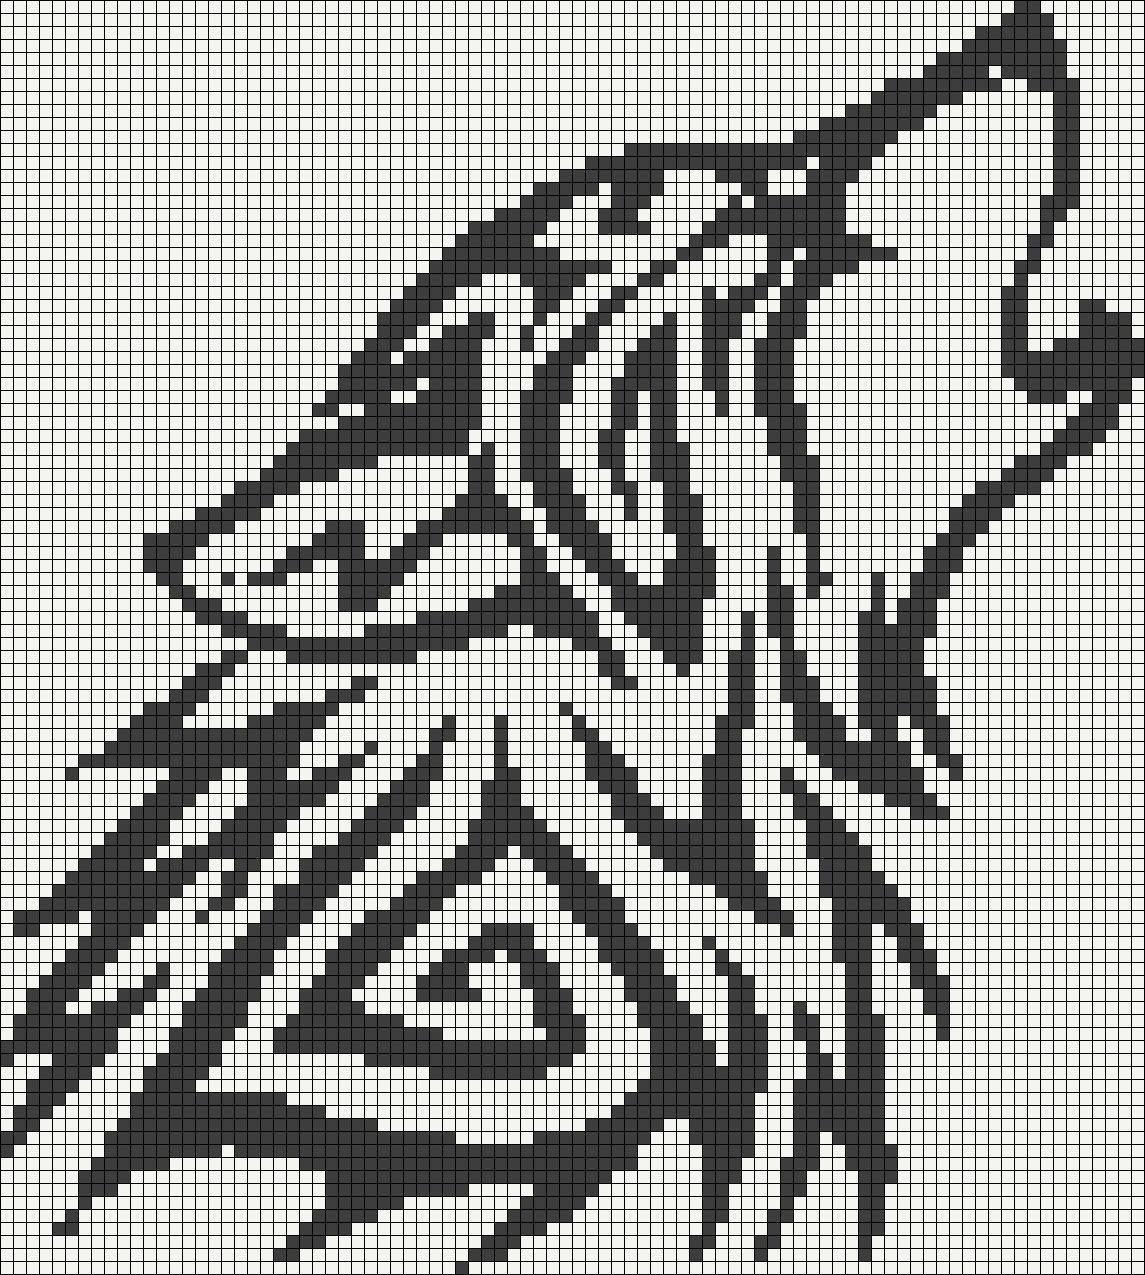 0928795287501d73908dd5d302841a2b.jpg 1\'145×1\'275 Pixel   Bolsito n ...